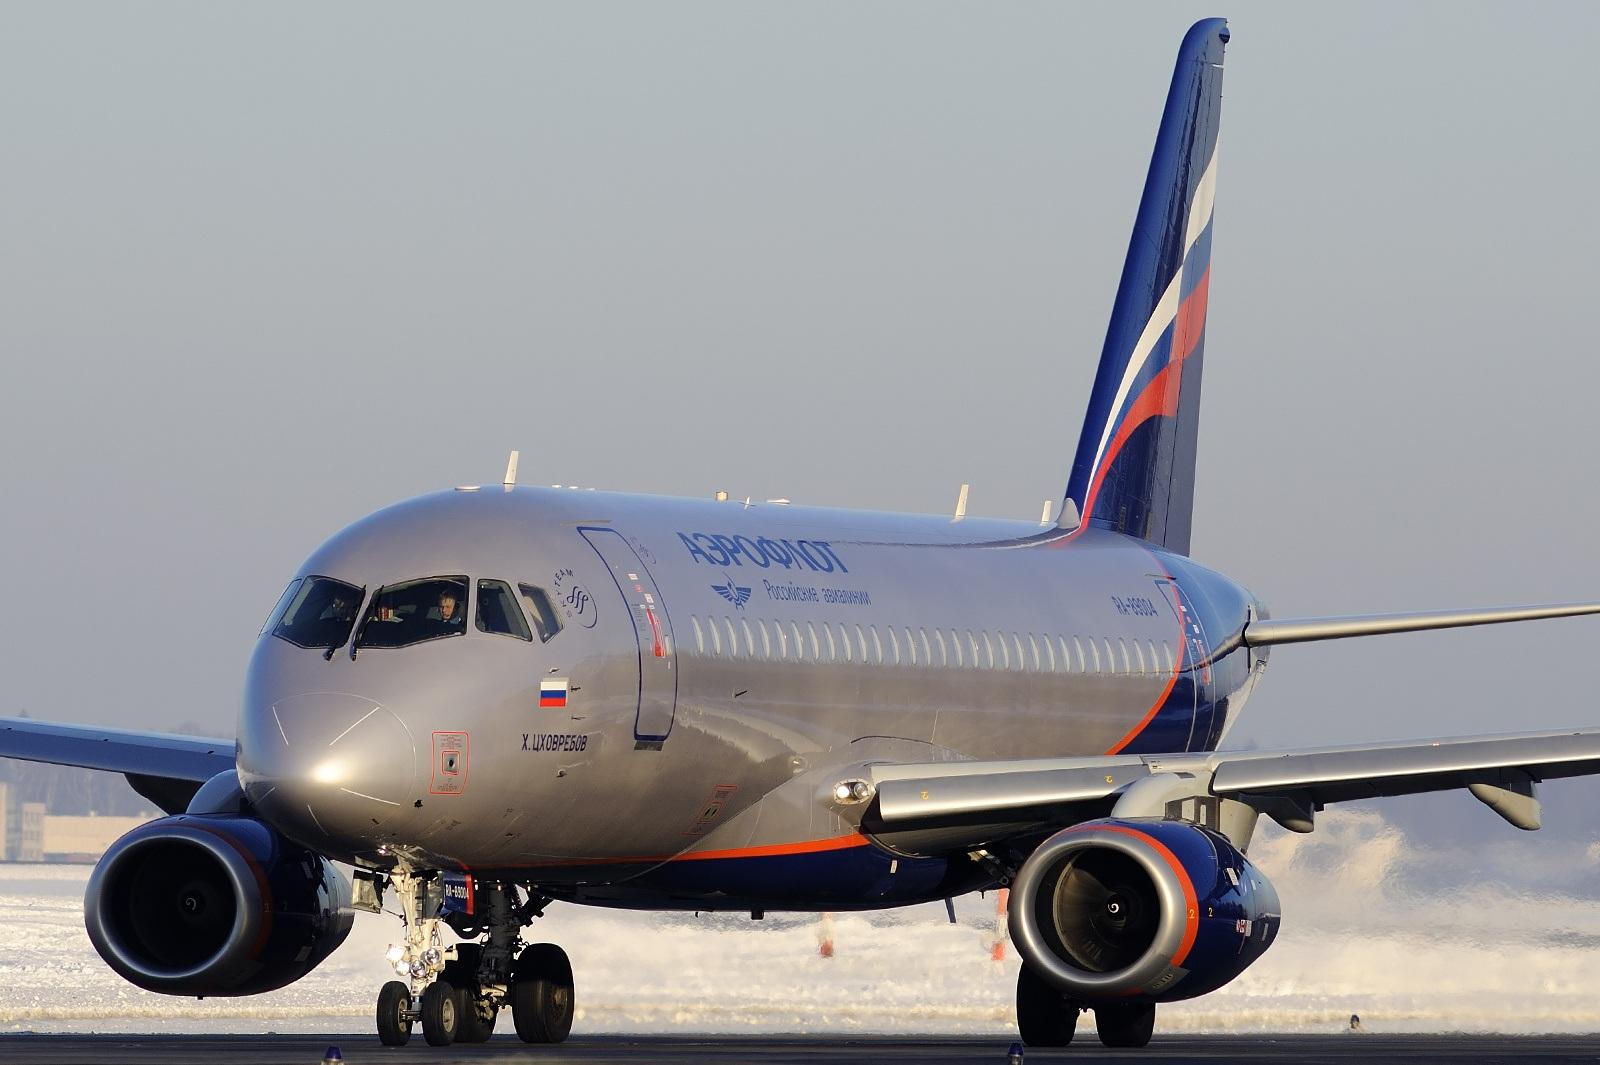 Sukhoi Superjet 100-95B fra Aeroflot (Foto: Nikiforov Konstantin | GNU 1.2)